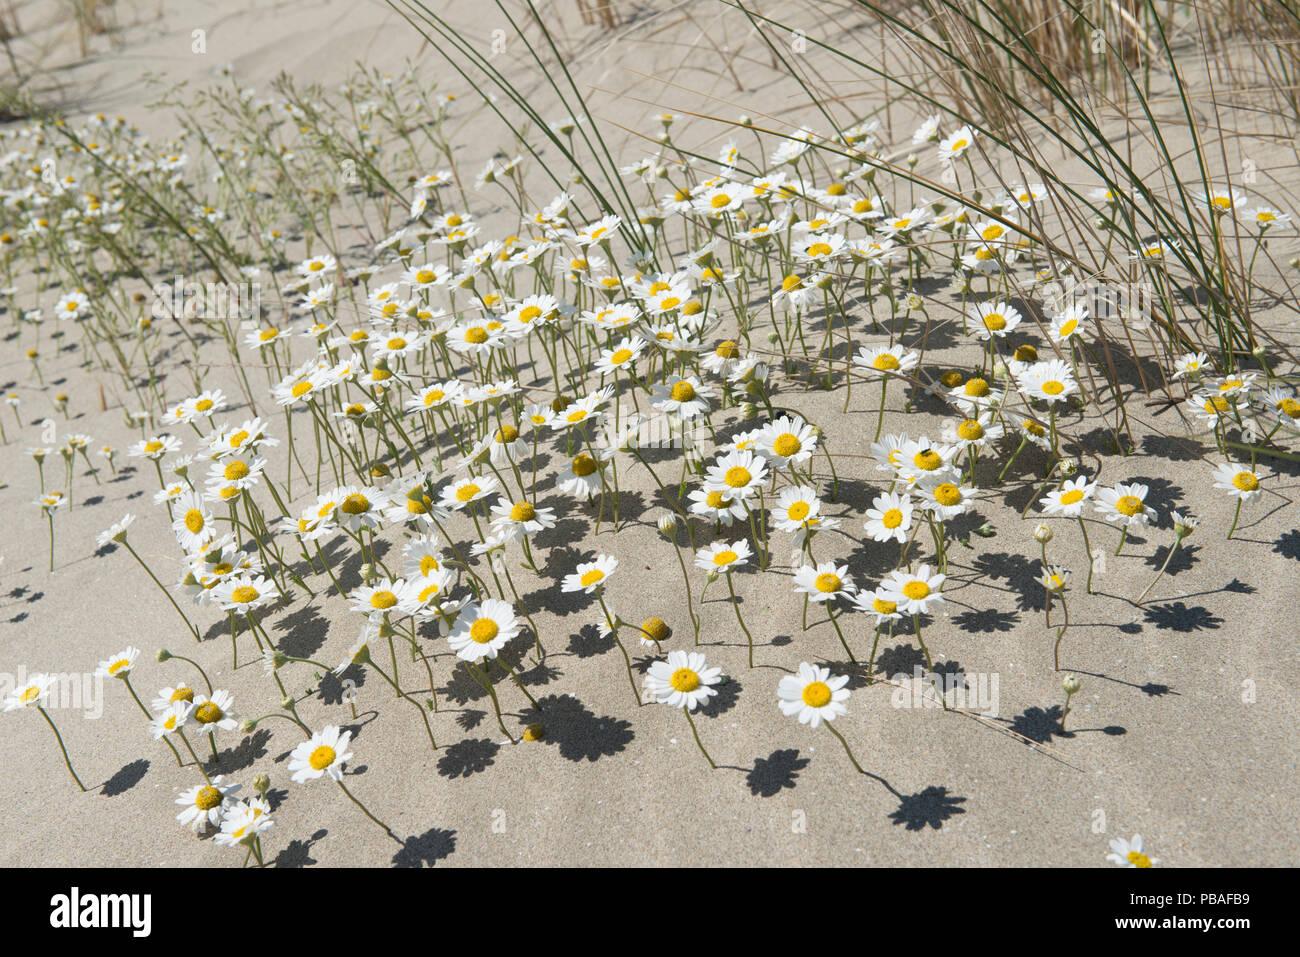 Sea chamomile (Anthemis maritima) in sand dunes, Camargue, France, May. - Stock Image